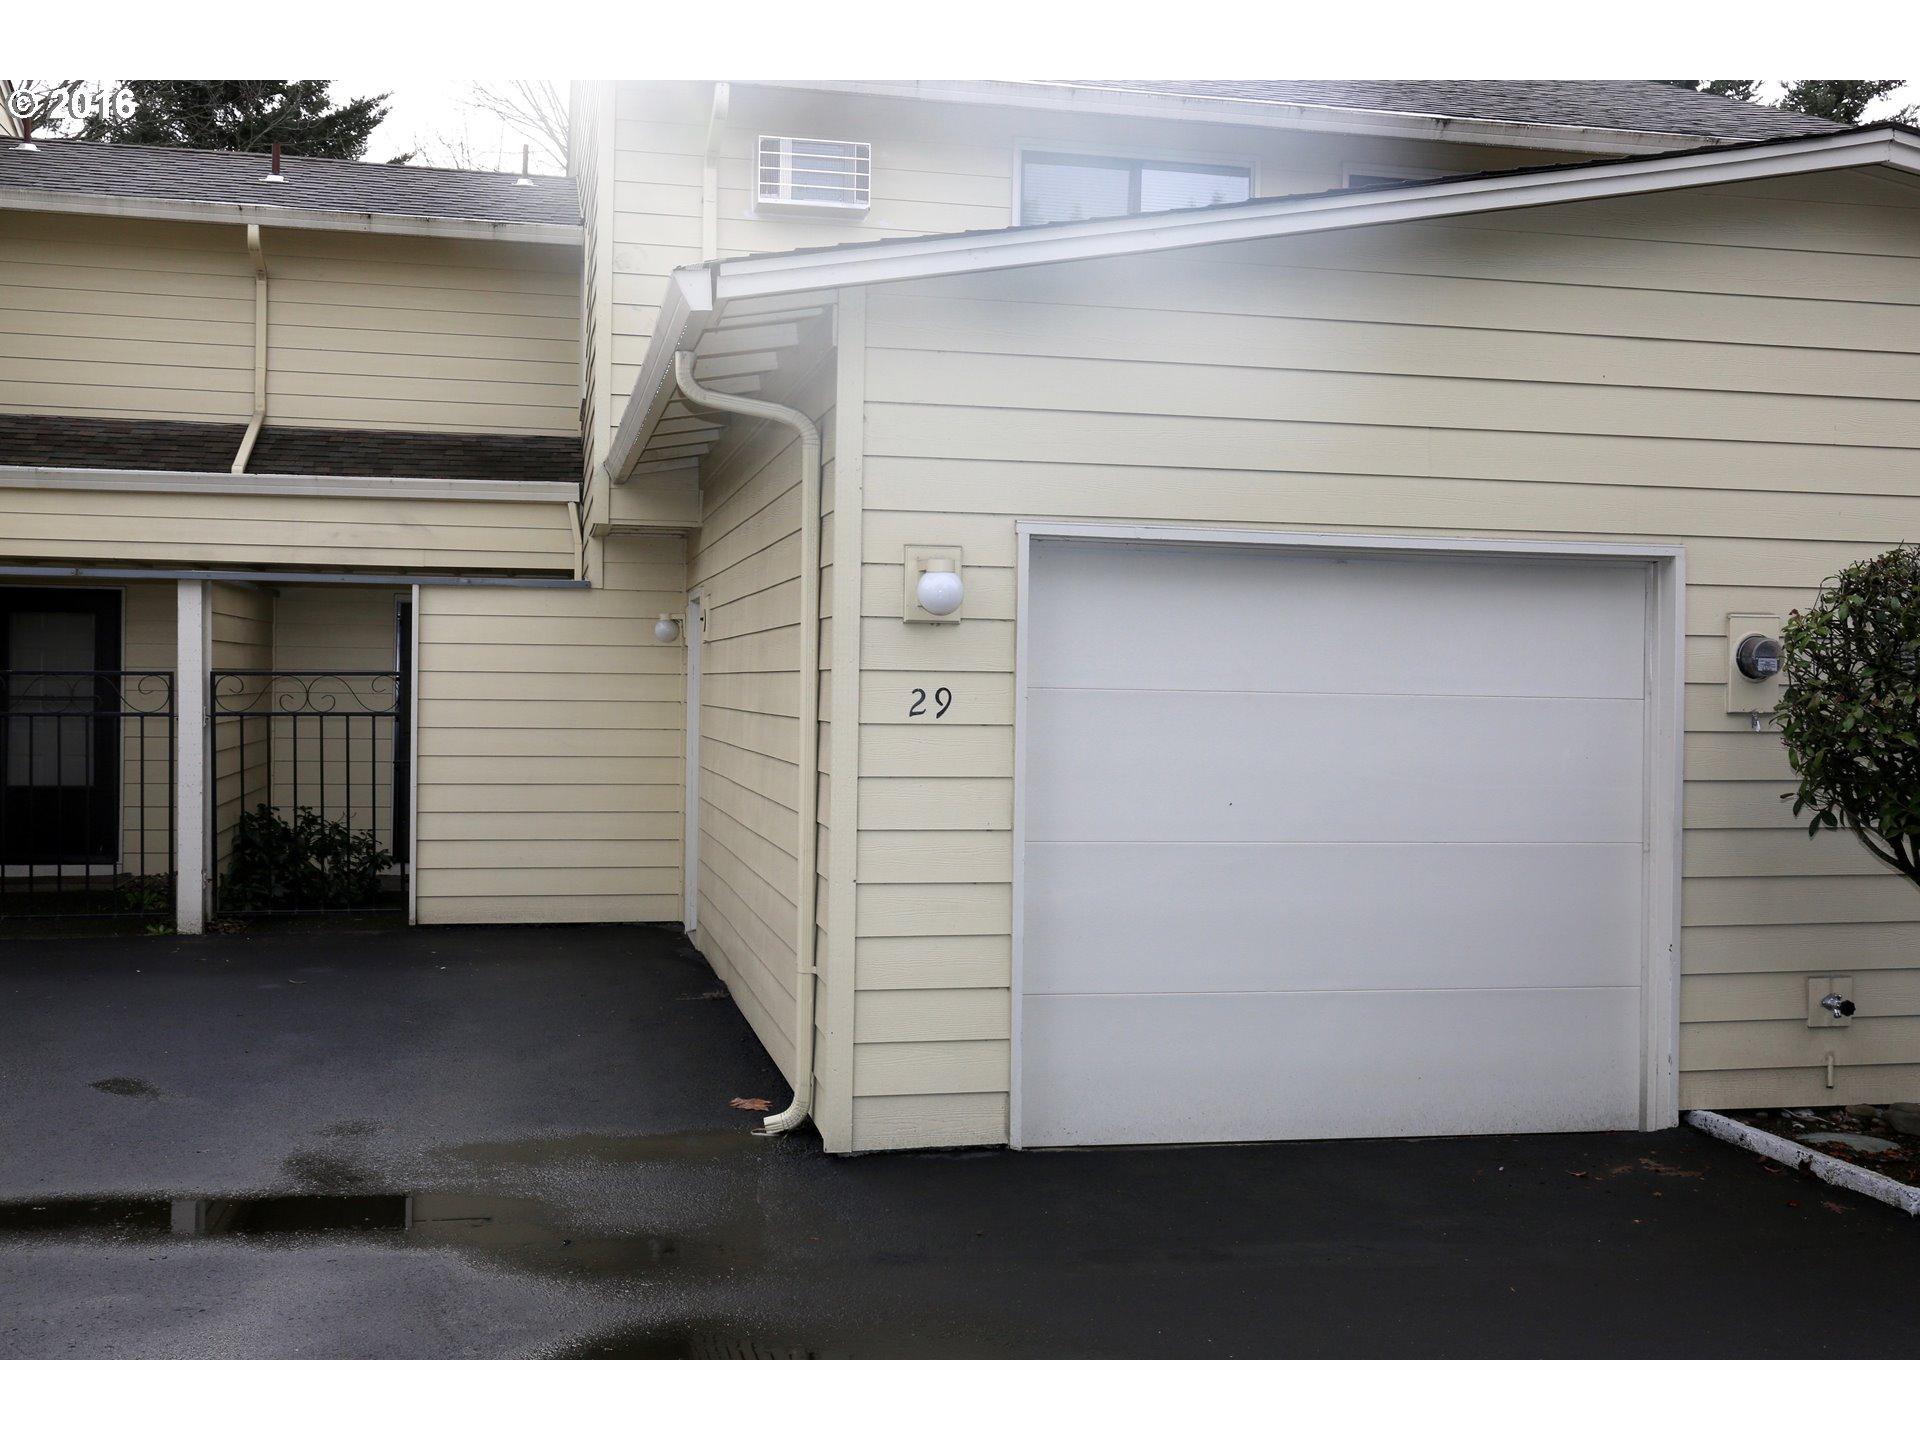 8620 NE MASON DR Unit 29, Vancouver, WA 98662